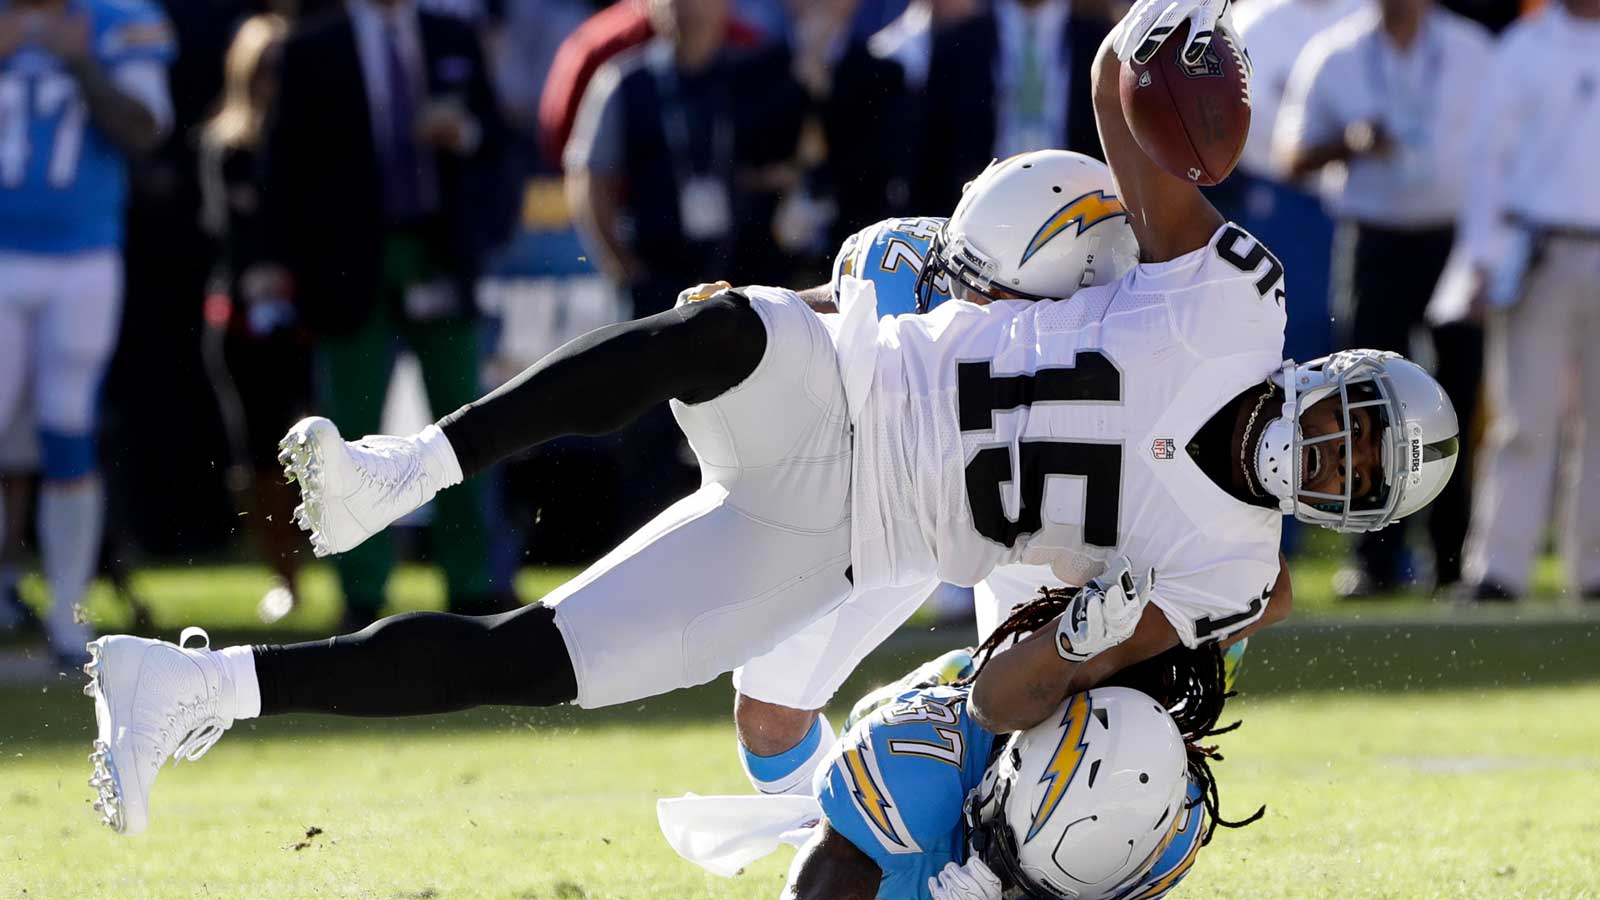 Janikowski, Raiders beat Bolts 19-16 to earn playoff berth